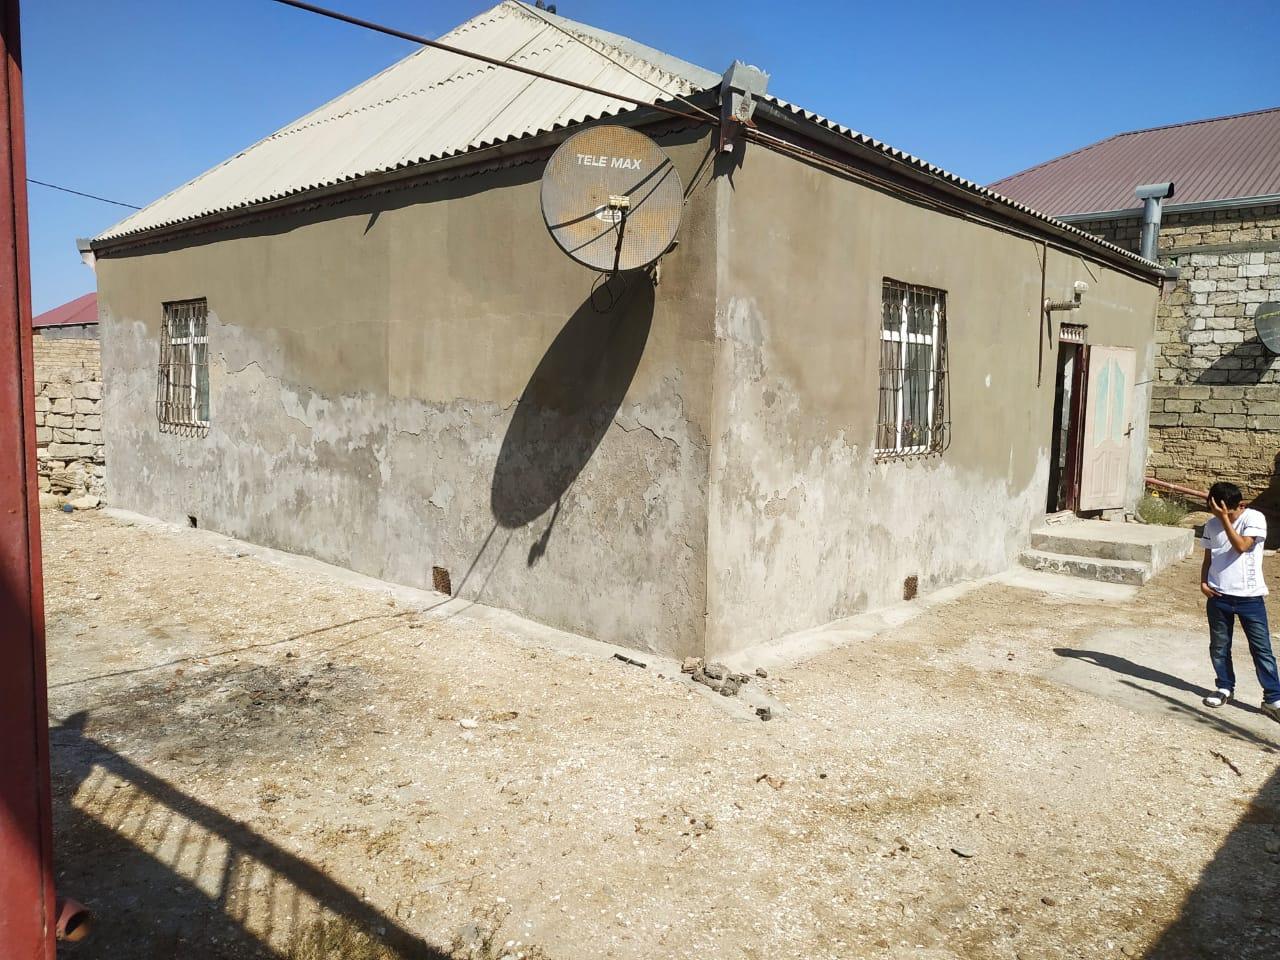 Zabrat qesebesi 2,5 sotda 120 kv.m sahesi olan 4 otagli ev